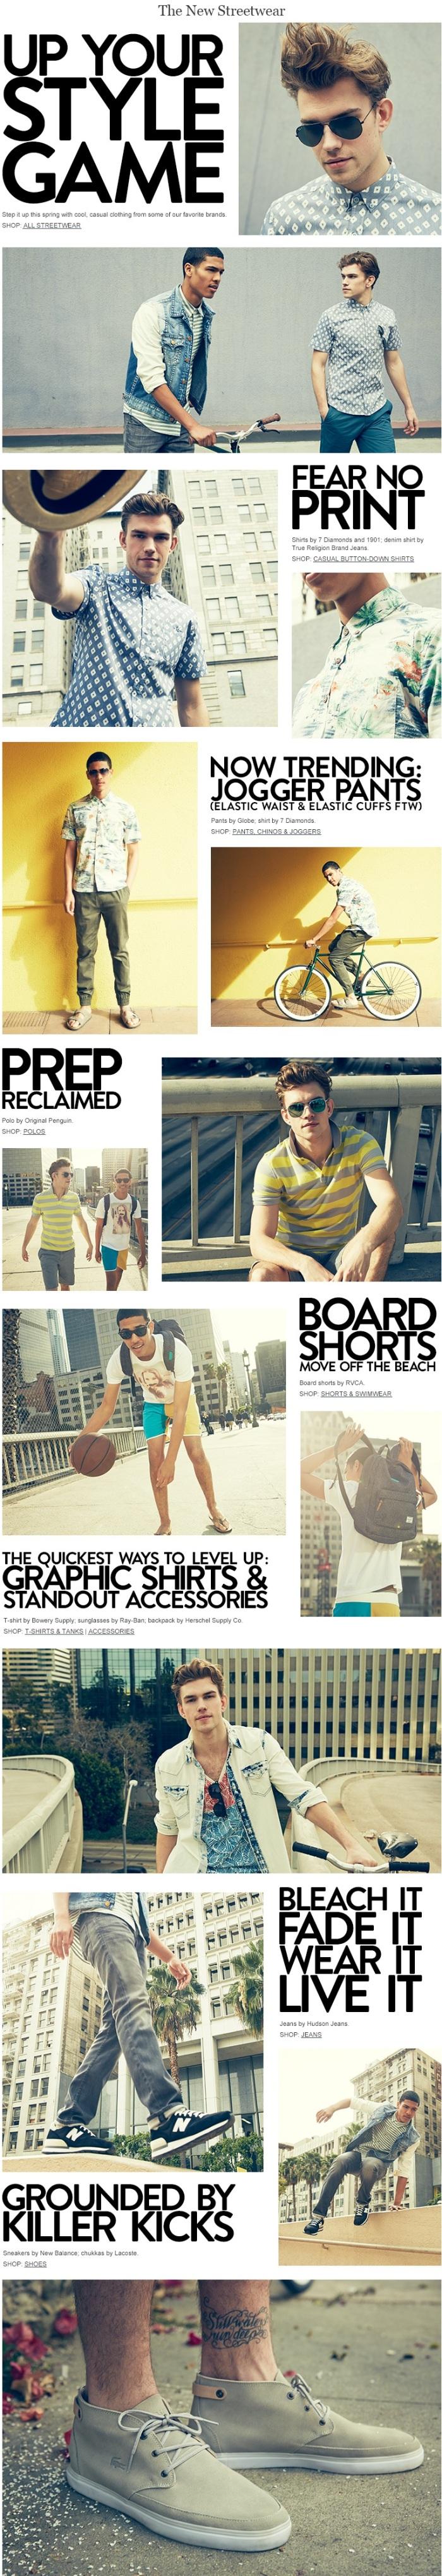 Oxford_New_Streetwear